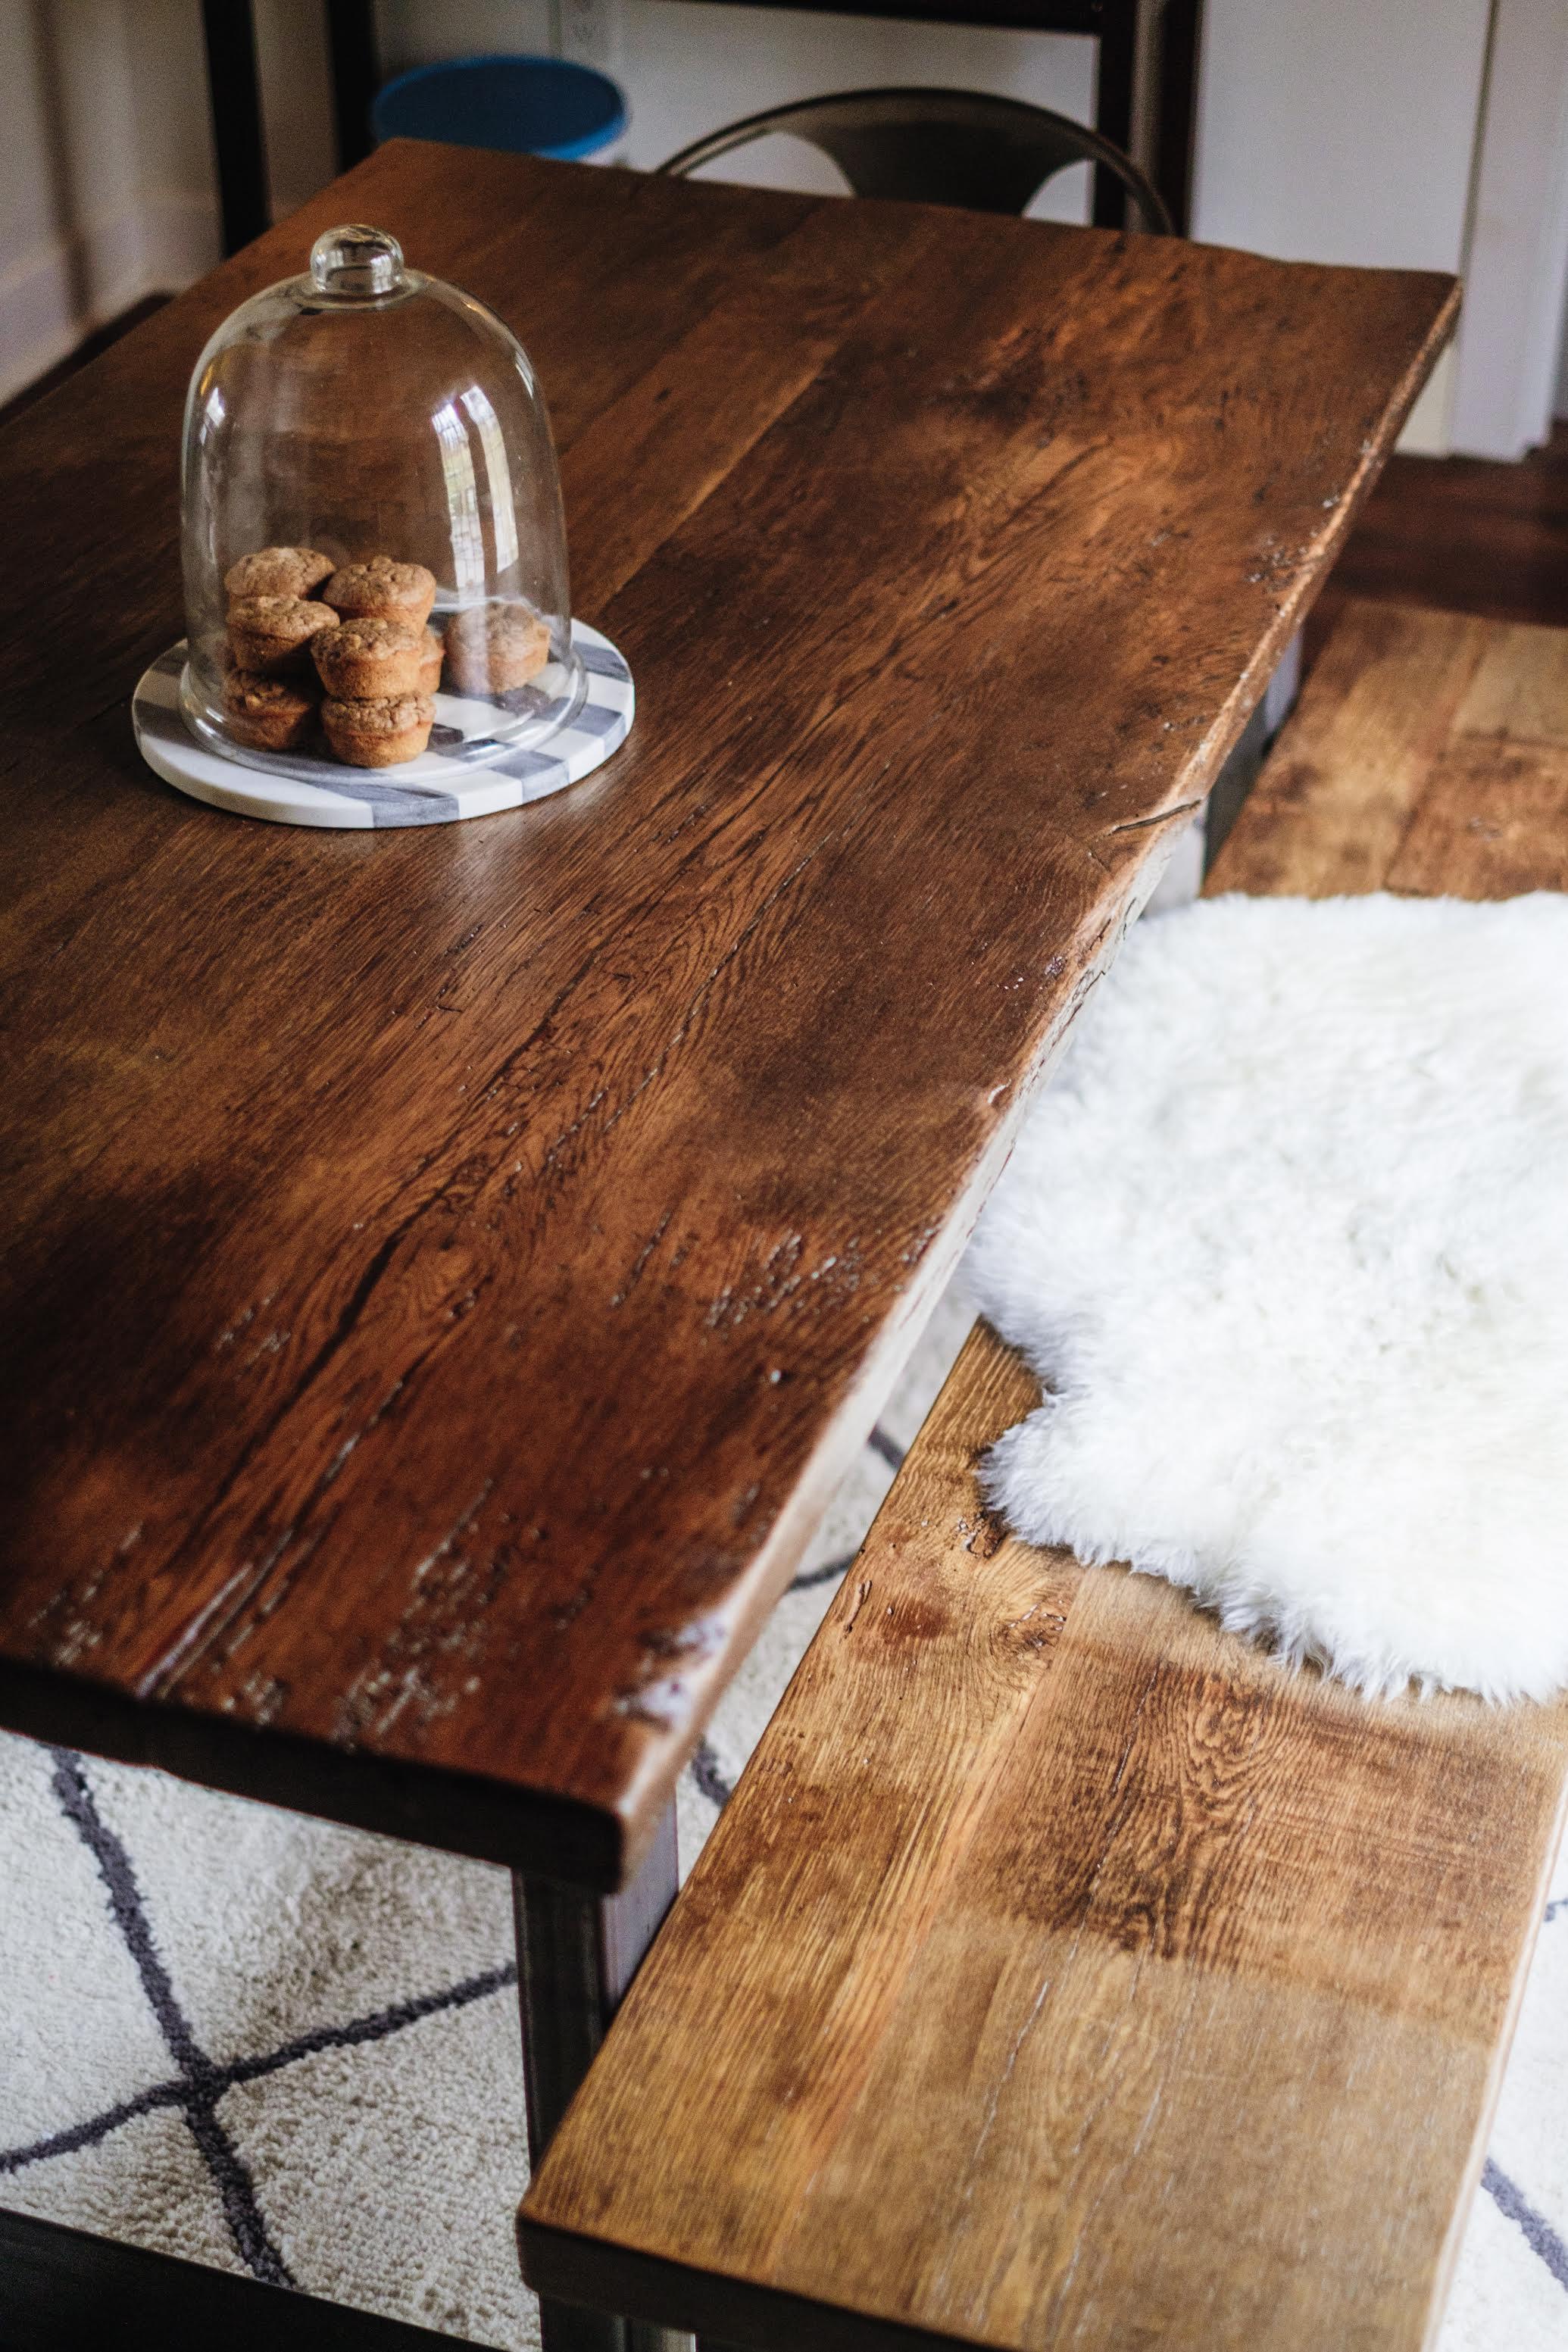 Pleasing Reclaimed Wood Plank Tables And Countertops Sylvan Brandt Download Free Architecture Designs Scobabritishbridgeorg